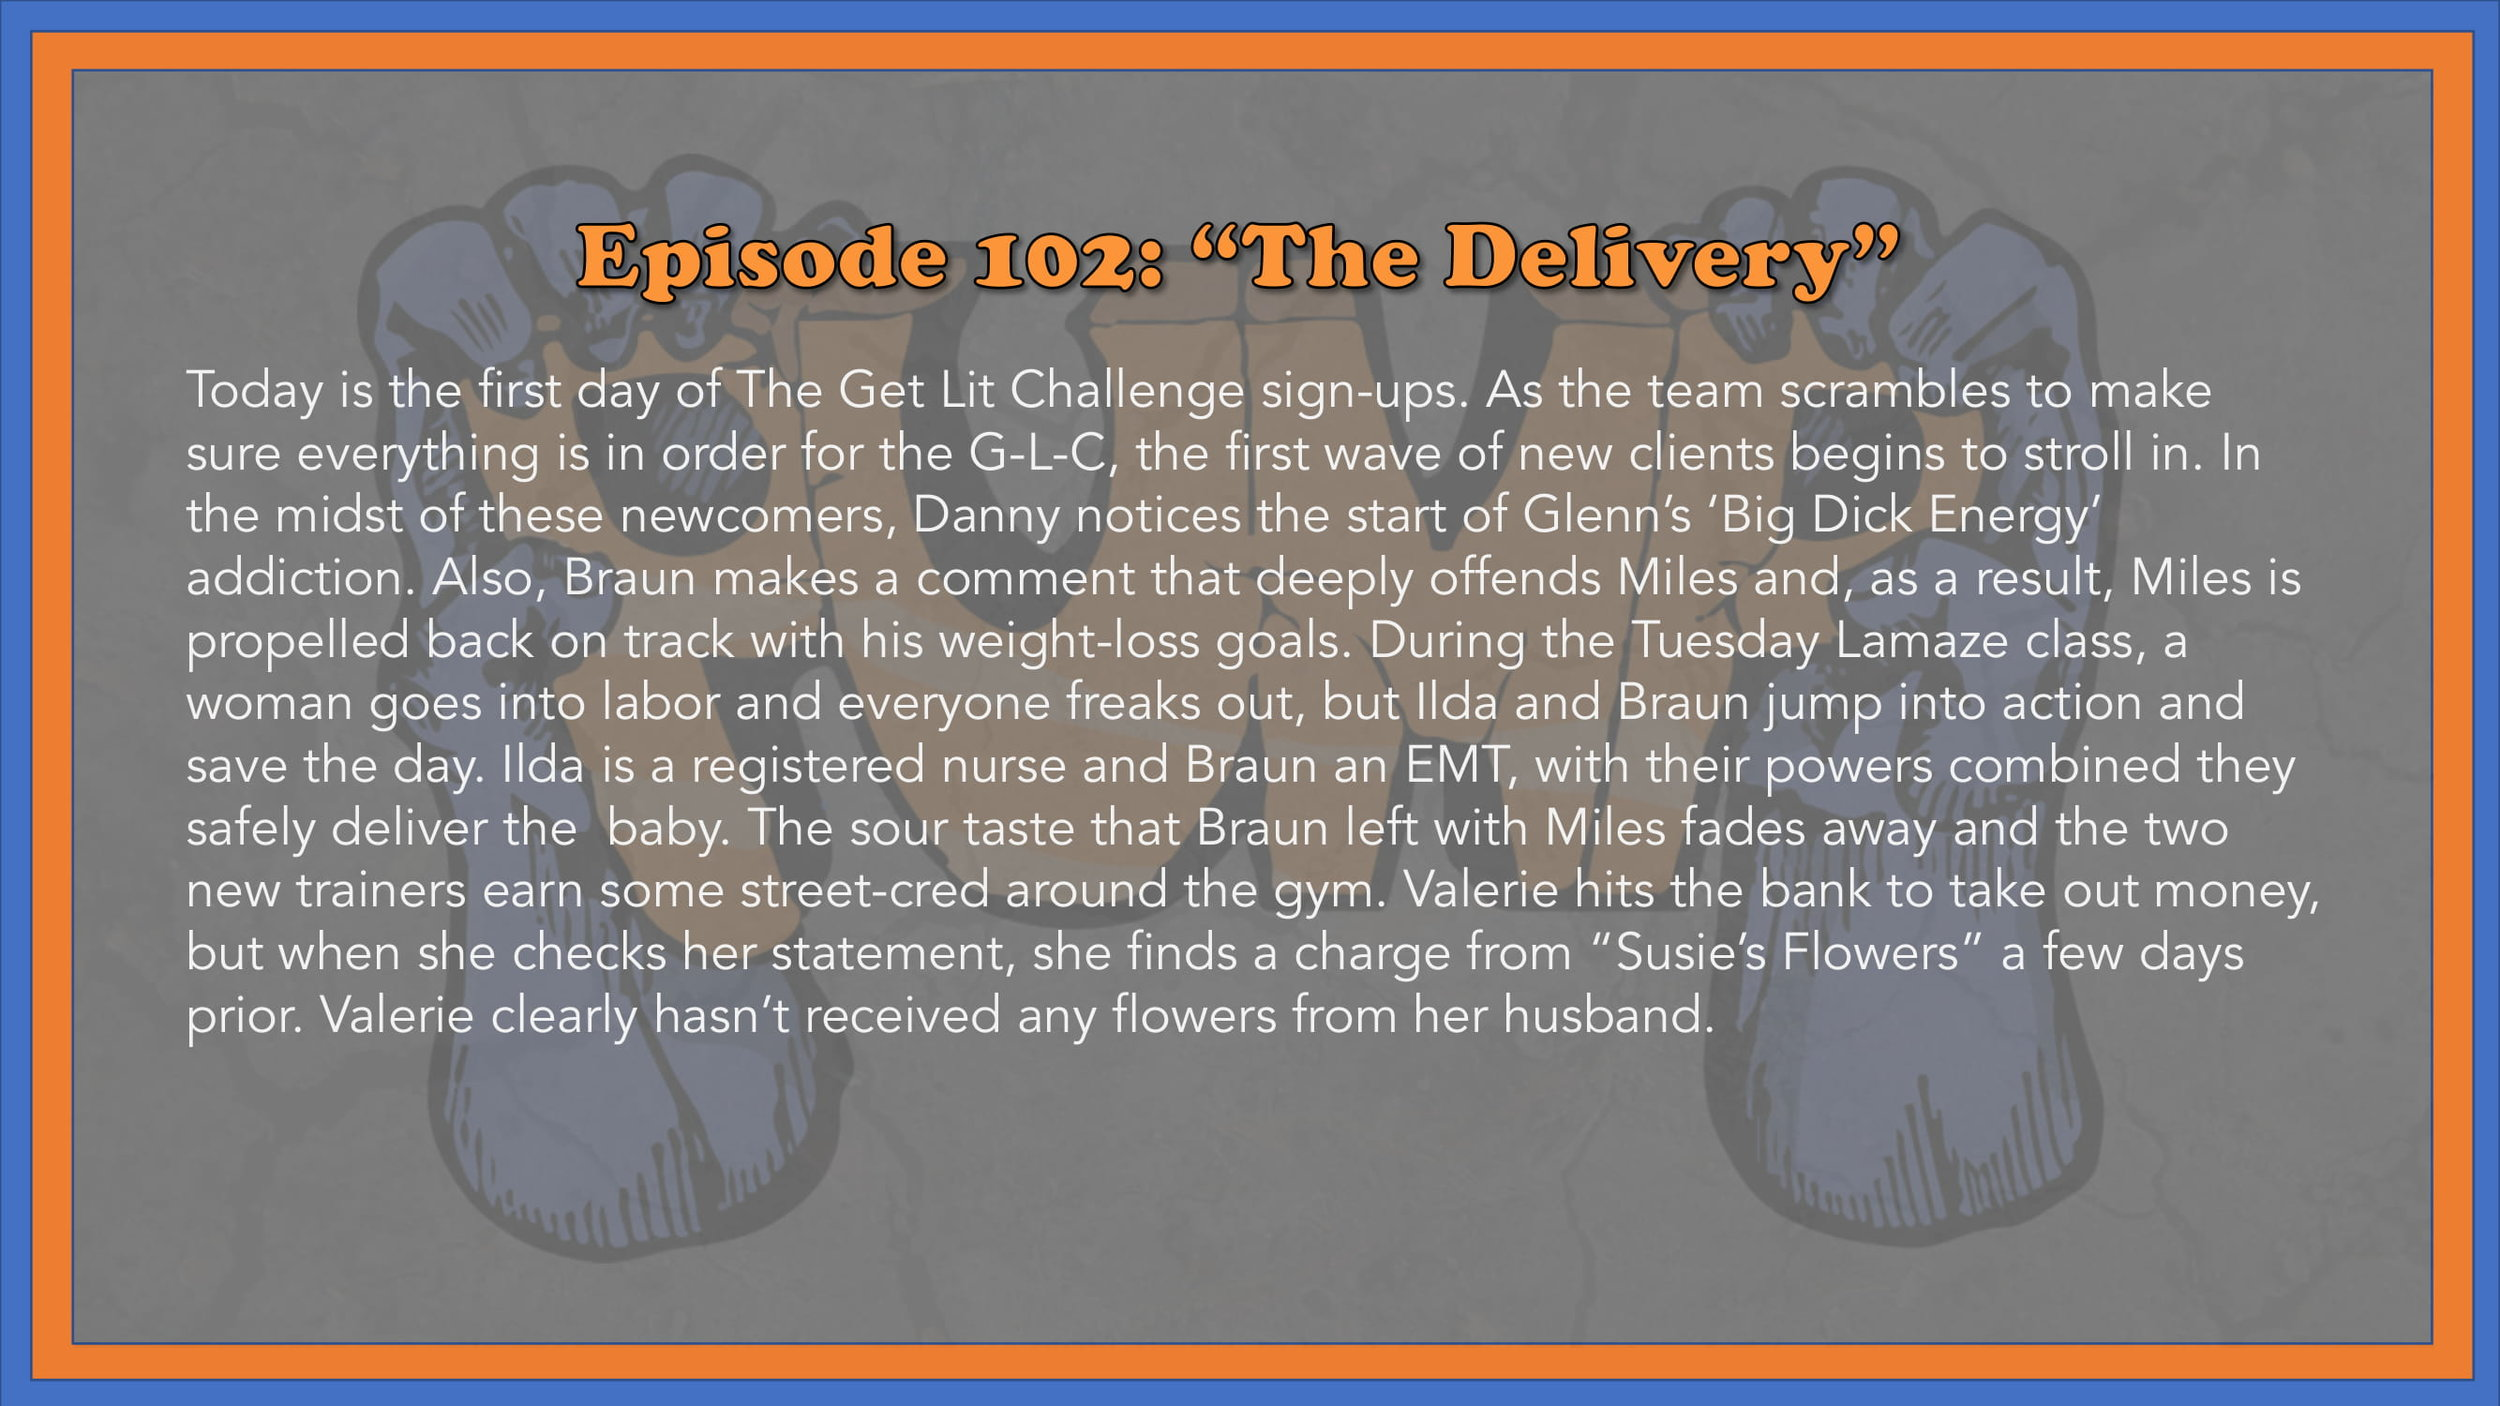 Pump Episode Outlines Season One 120618-3.jpg